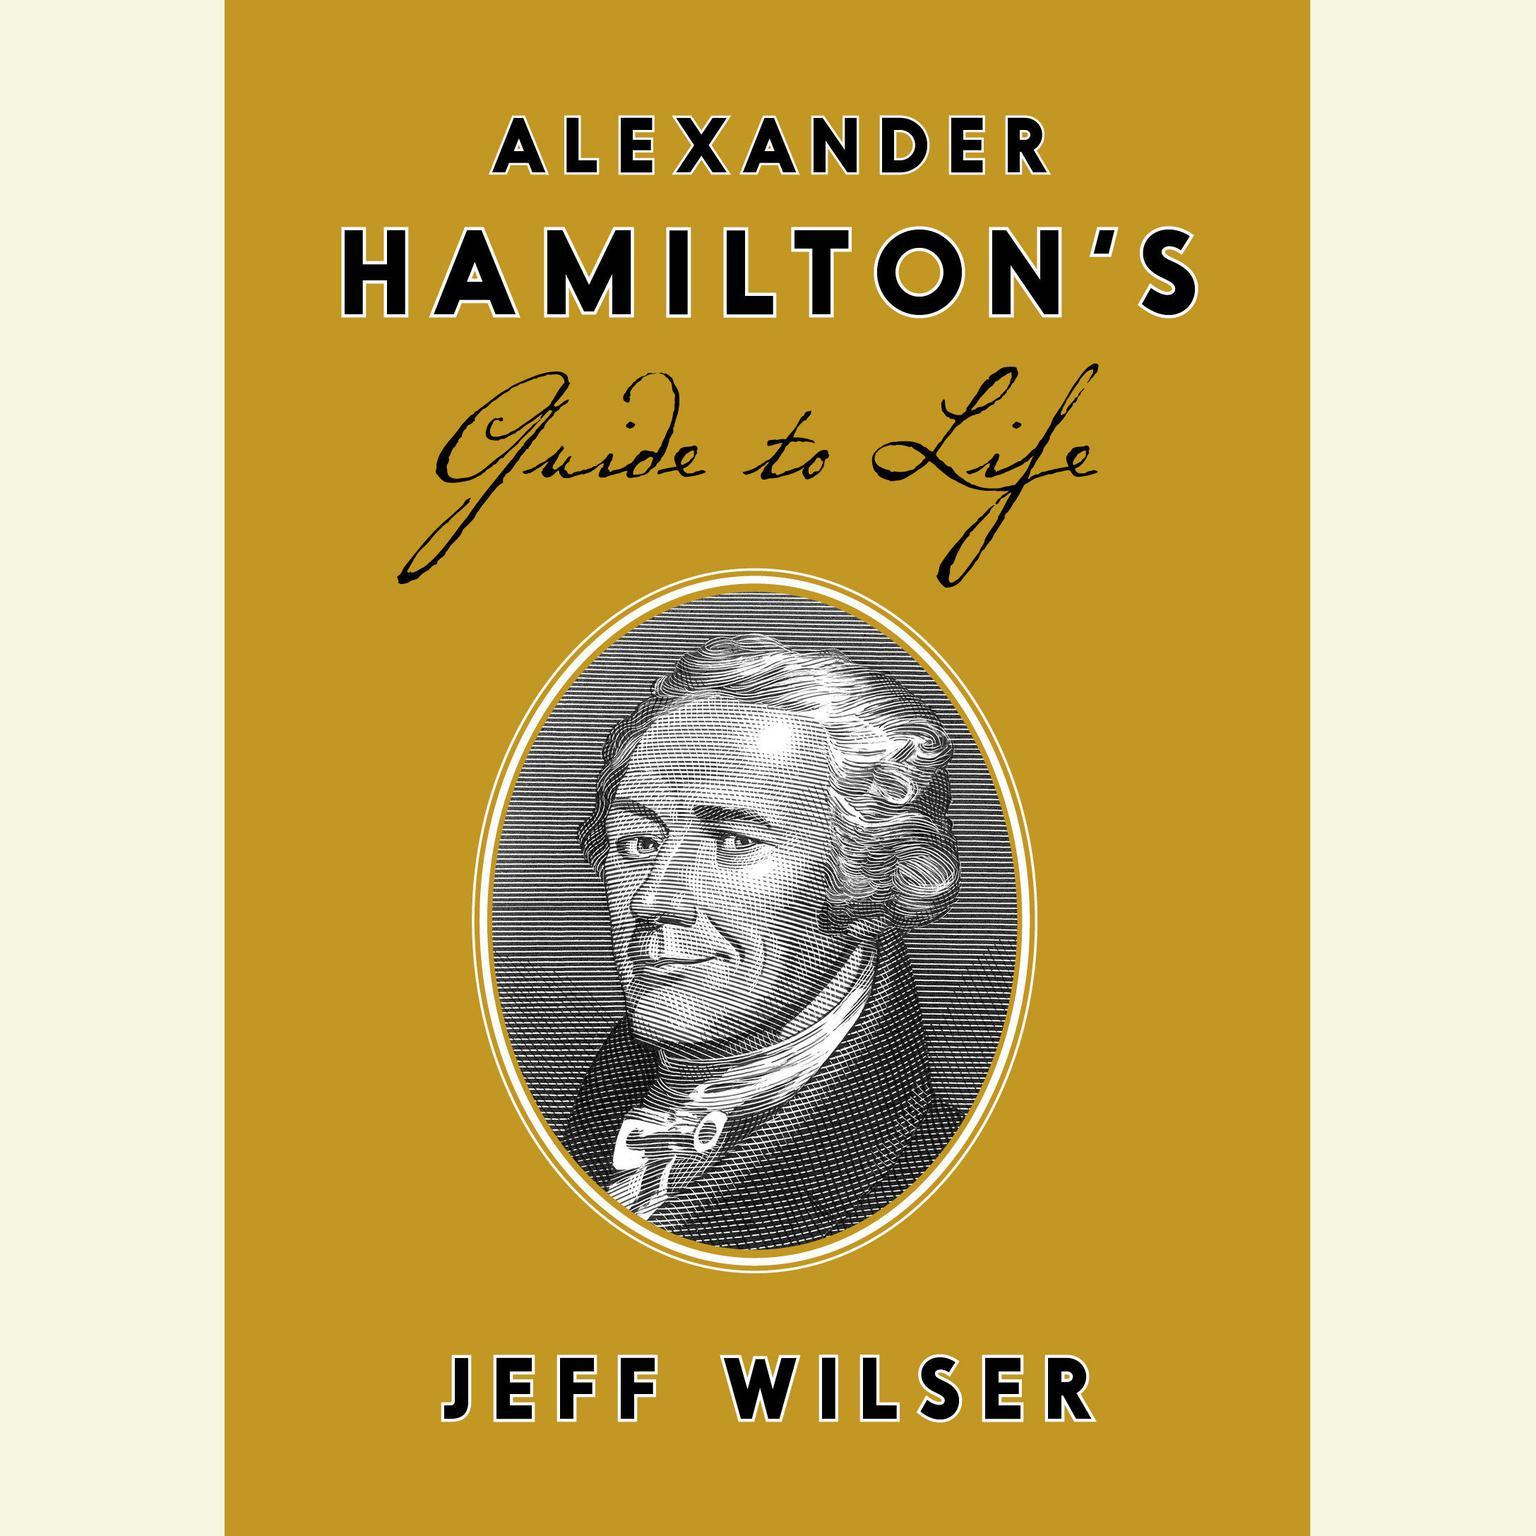 Alexander Hamiltons Guide to Life Audiobook, by Jeff Wilser